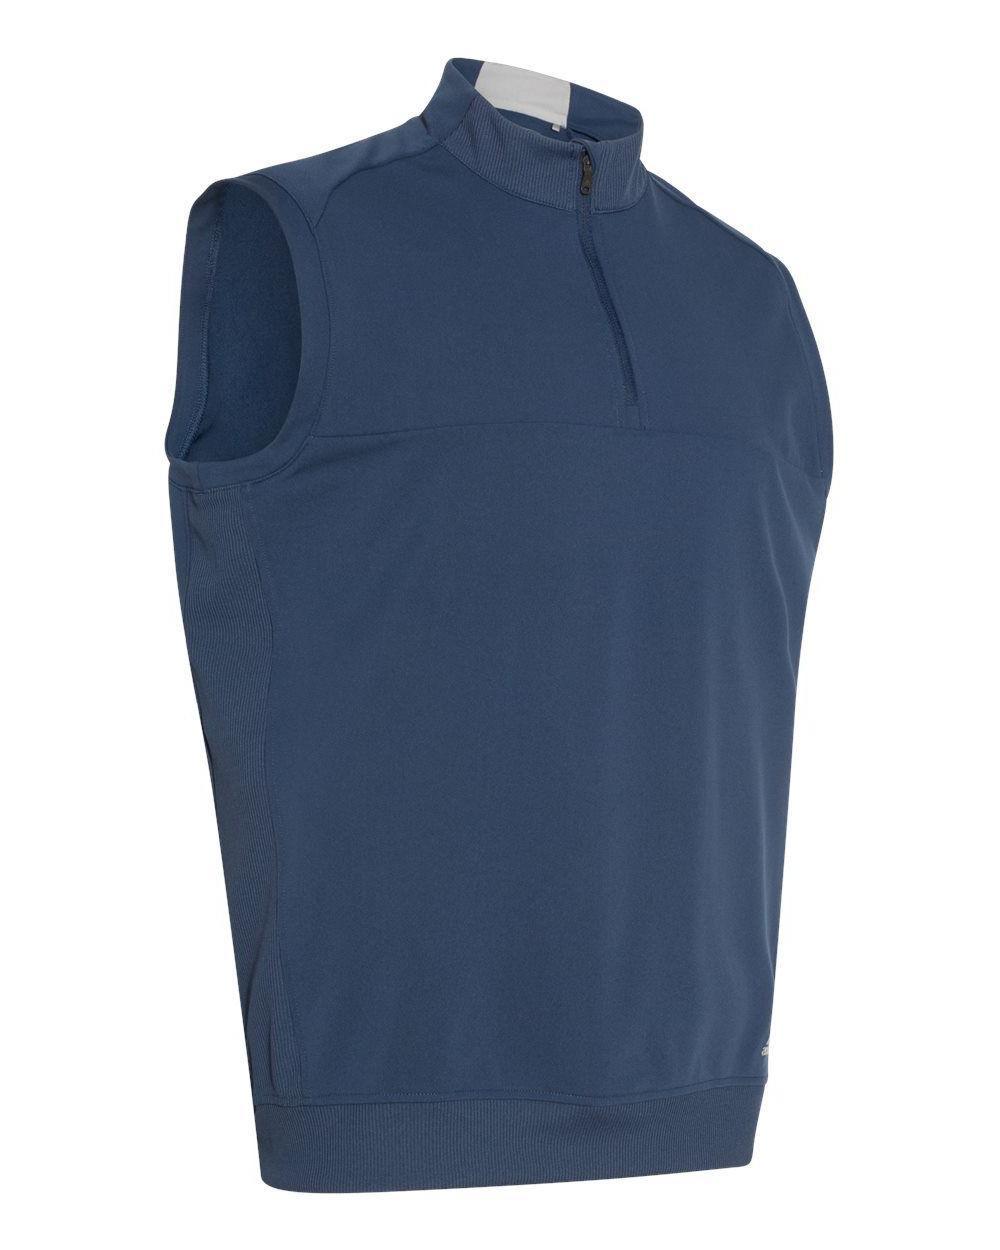 Adidas Golf or Jacket, Sizes UPF A270, A271